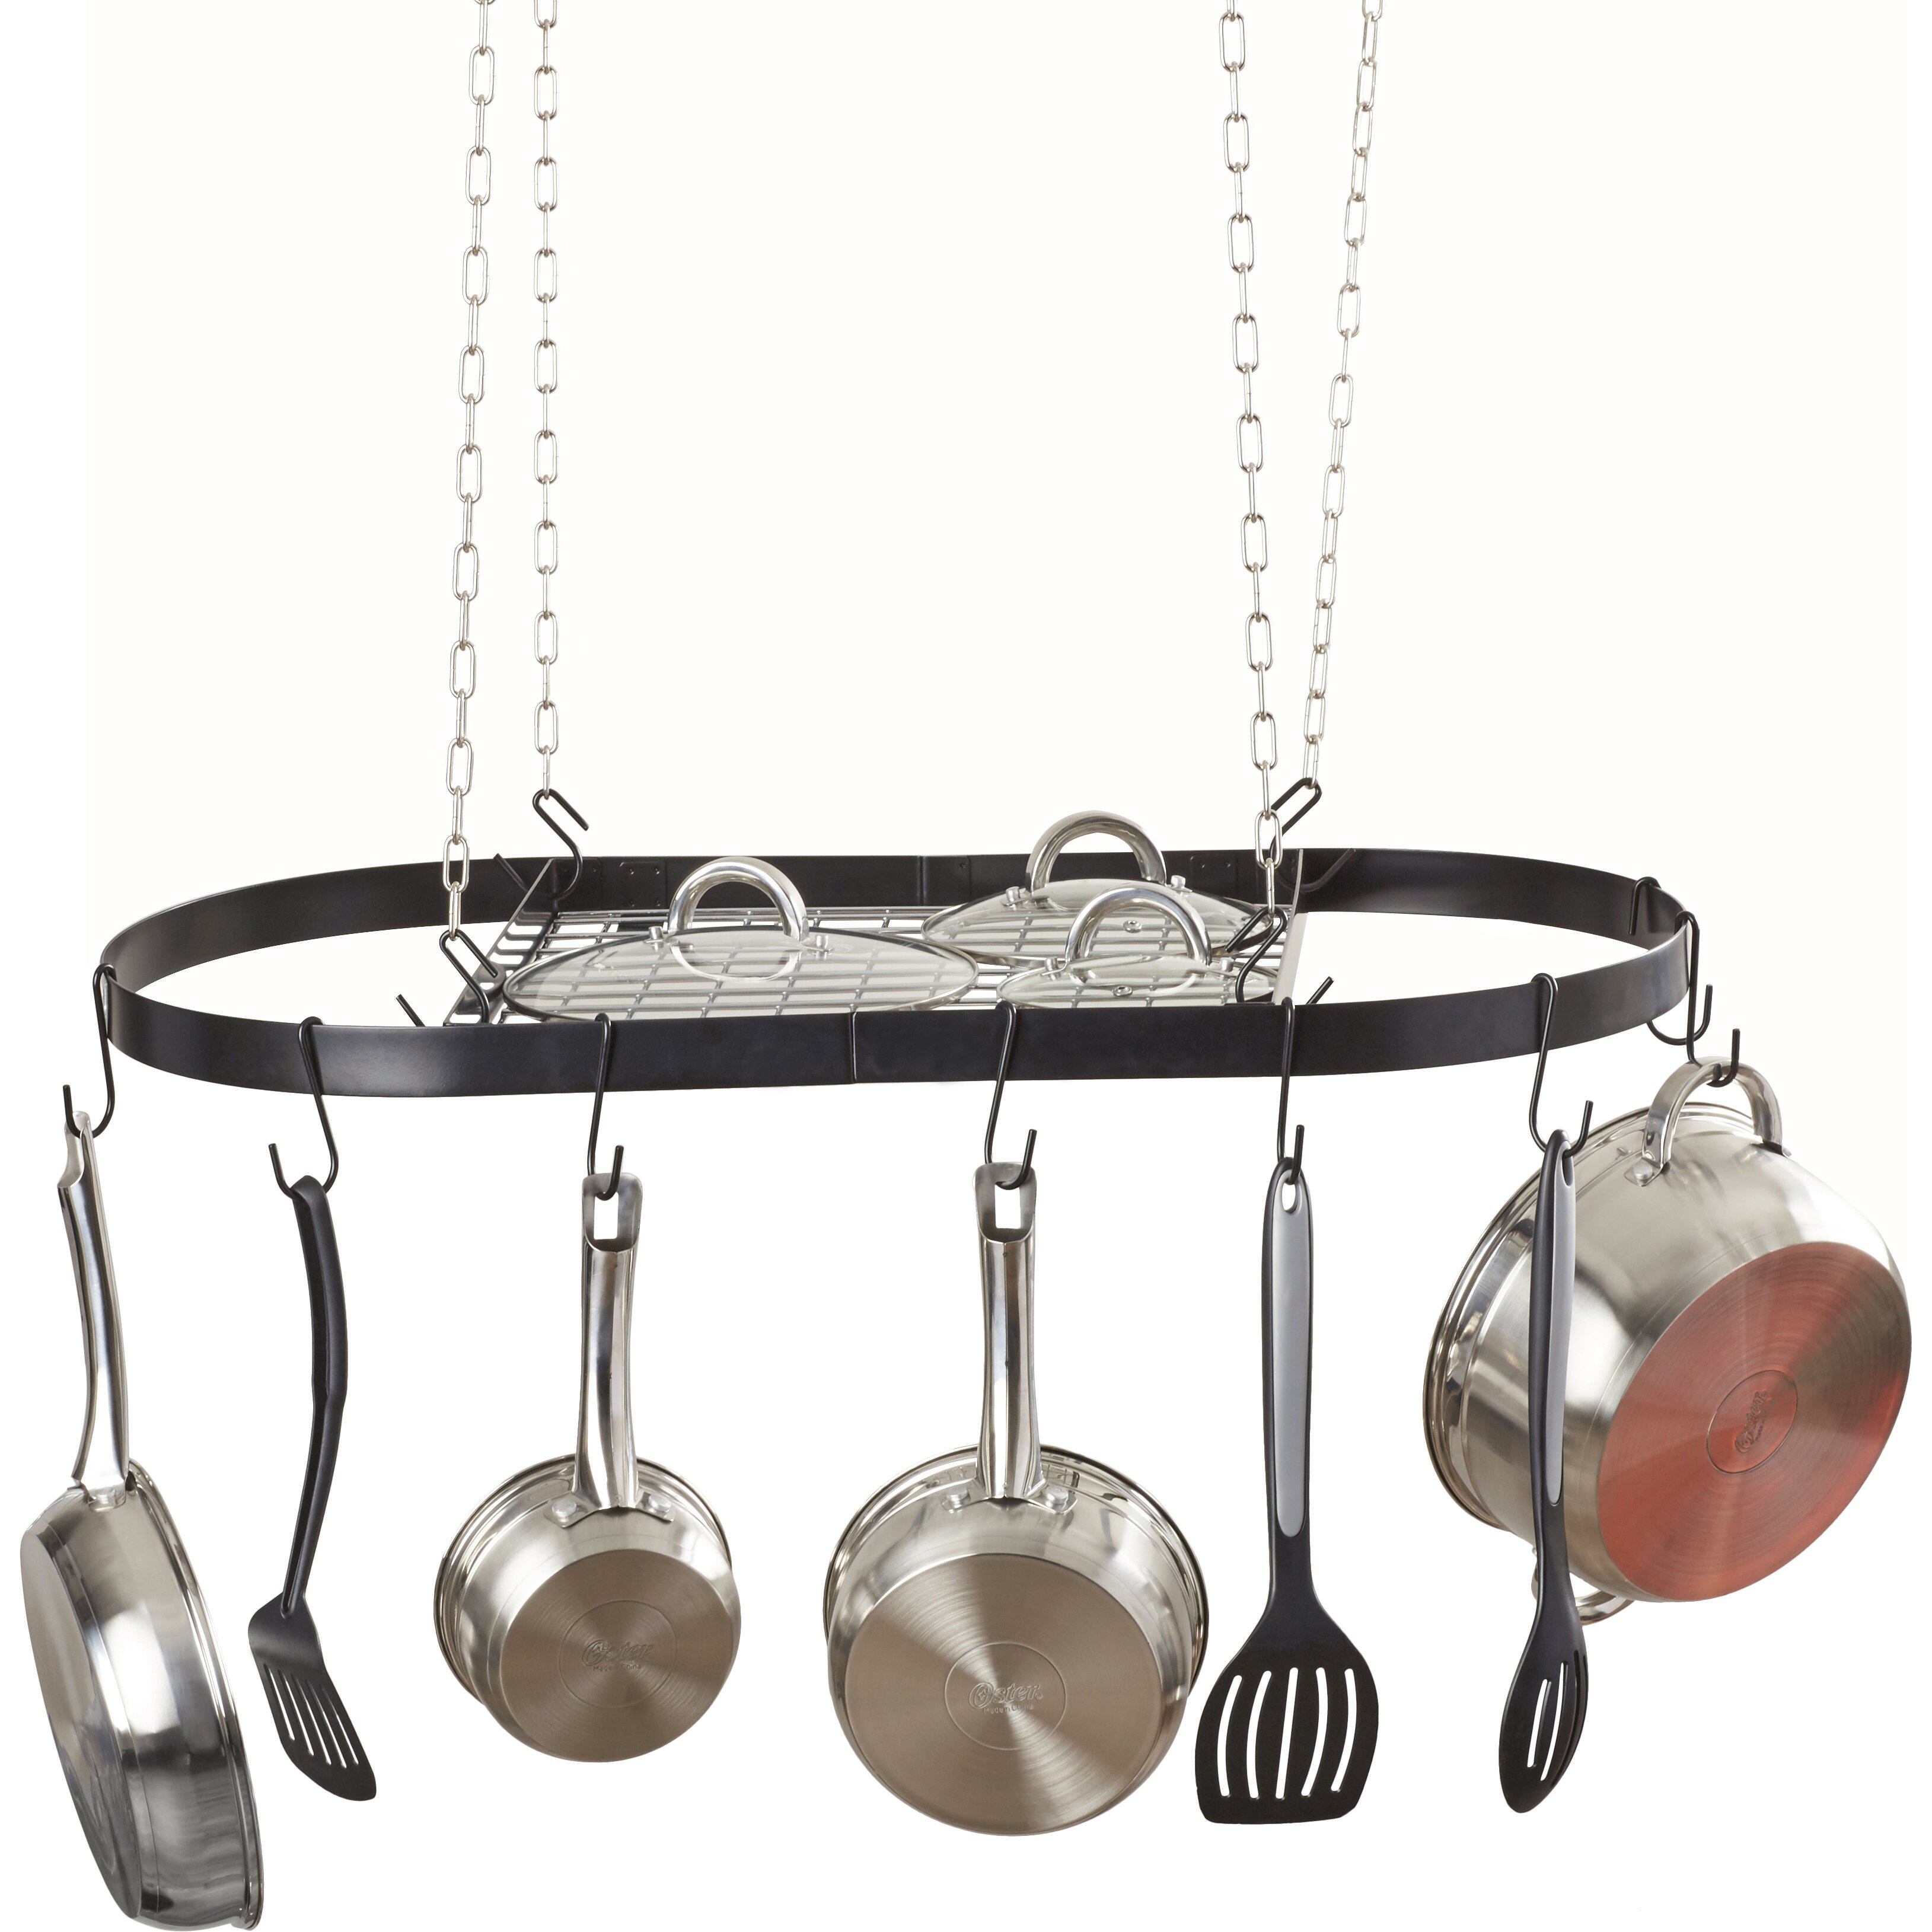 Varick Gallery Oval Hanging Pot Rack & Reviews | Wayfair